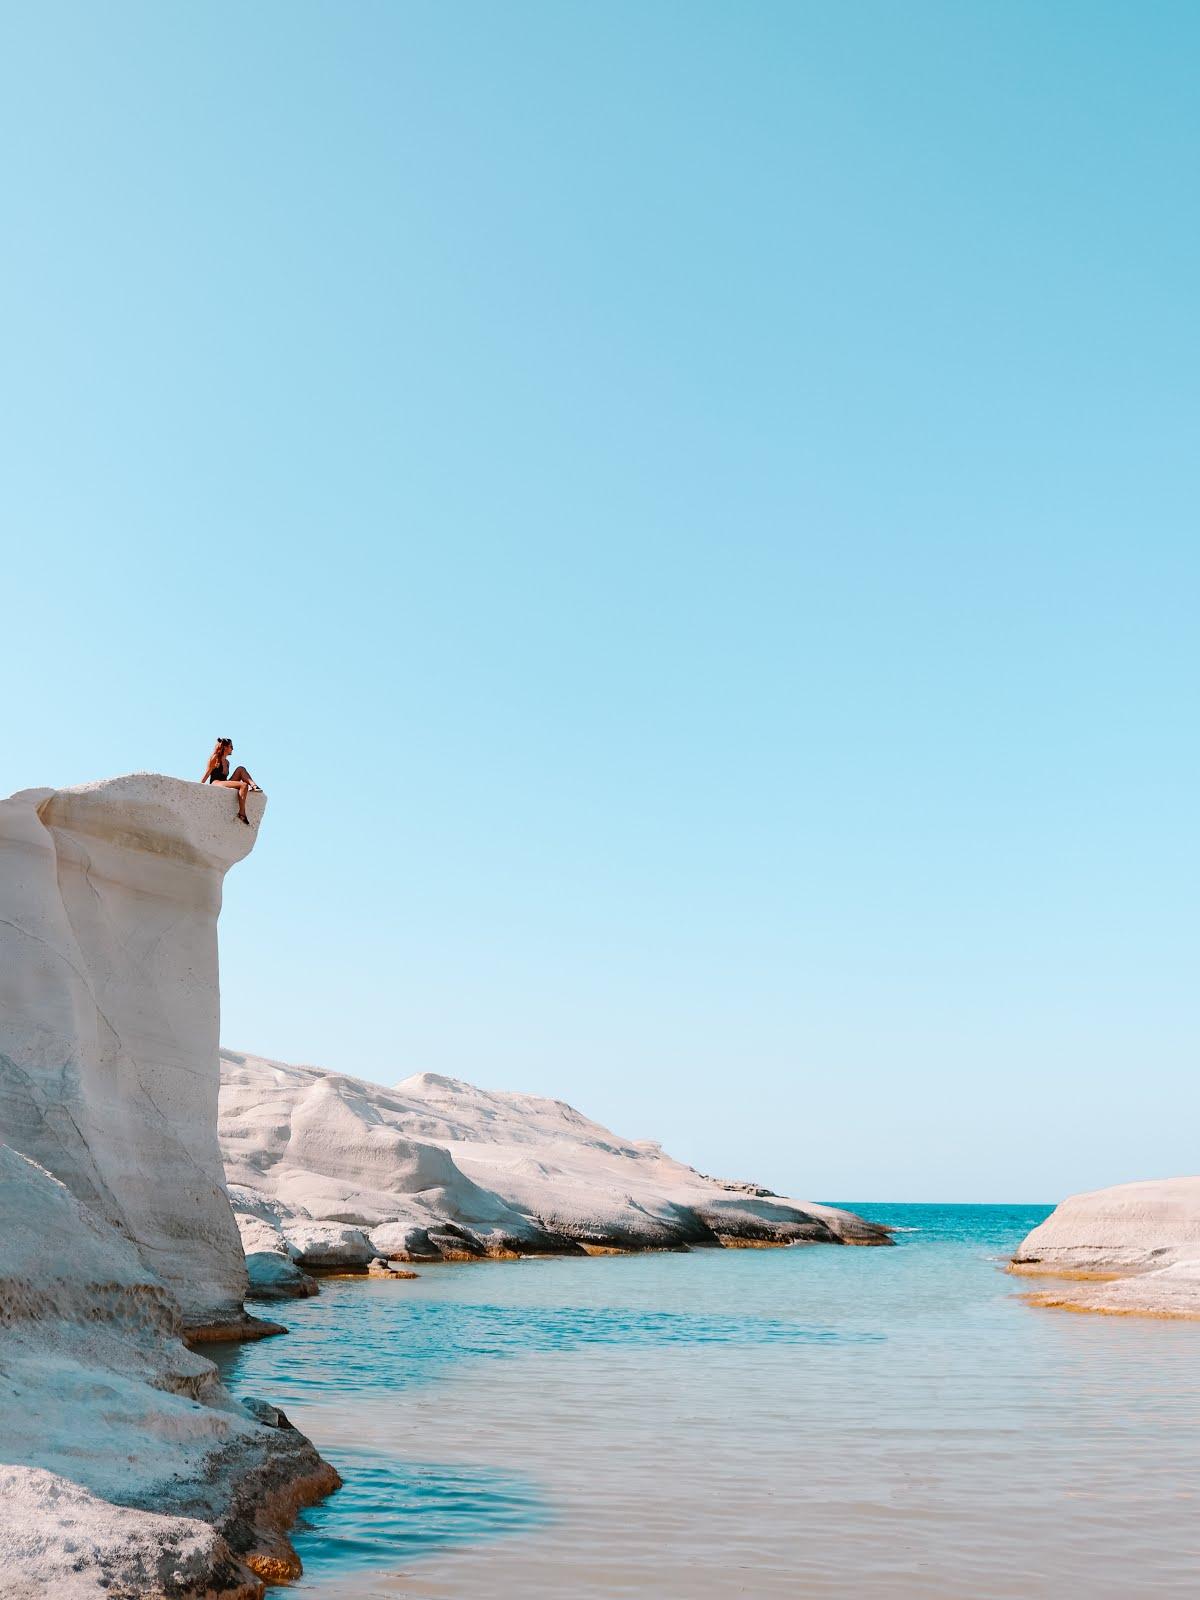 Sarakiniko Beach Cliff in Milos island, Greece